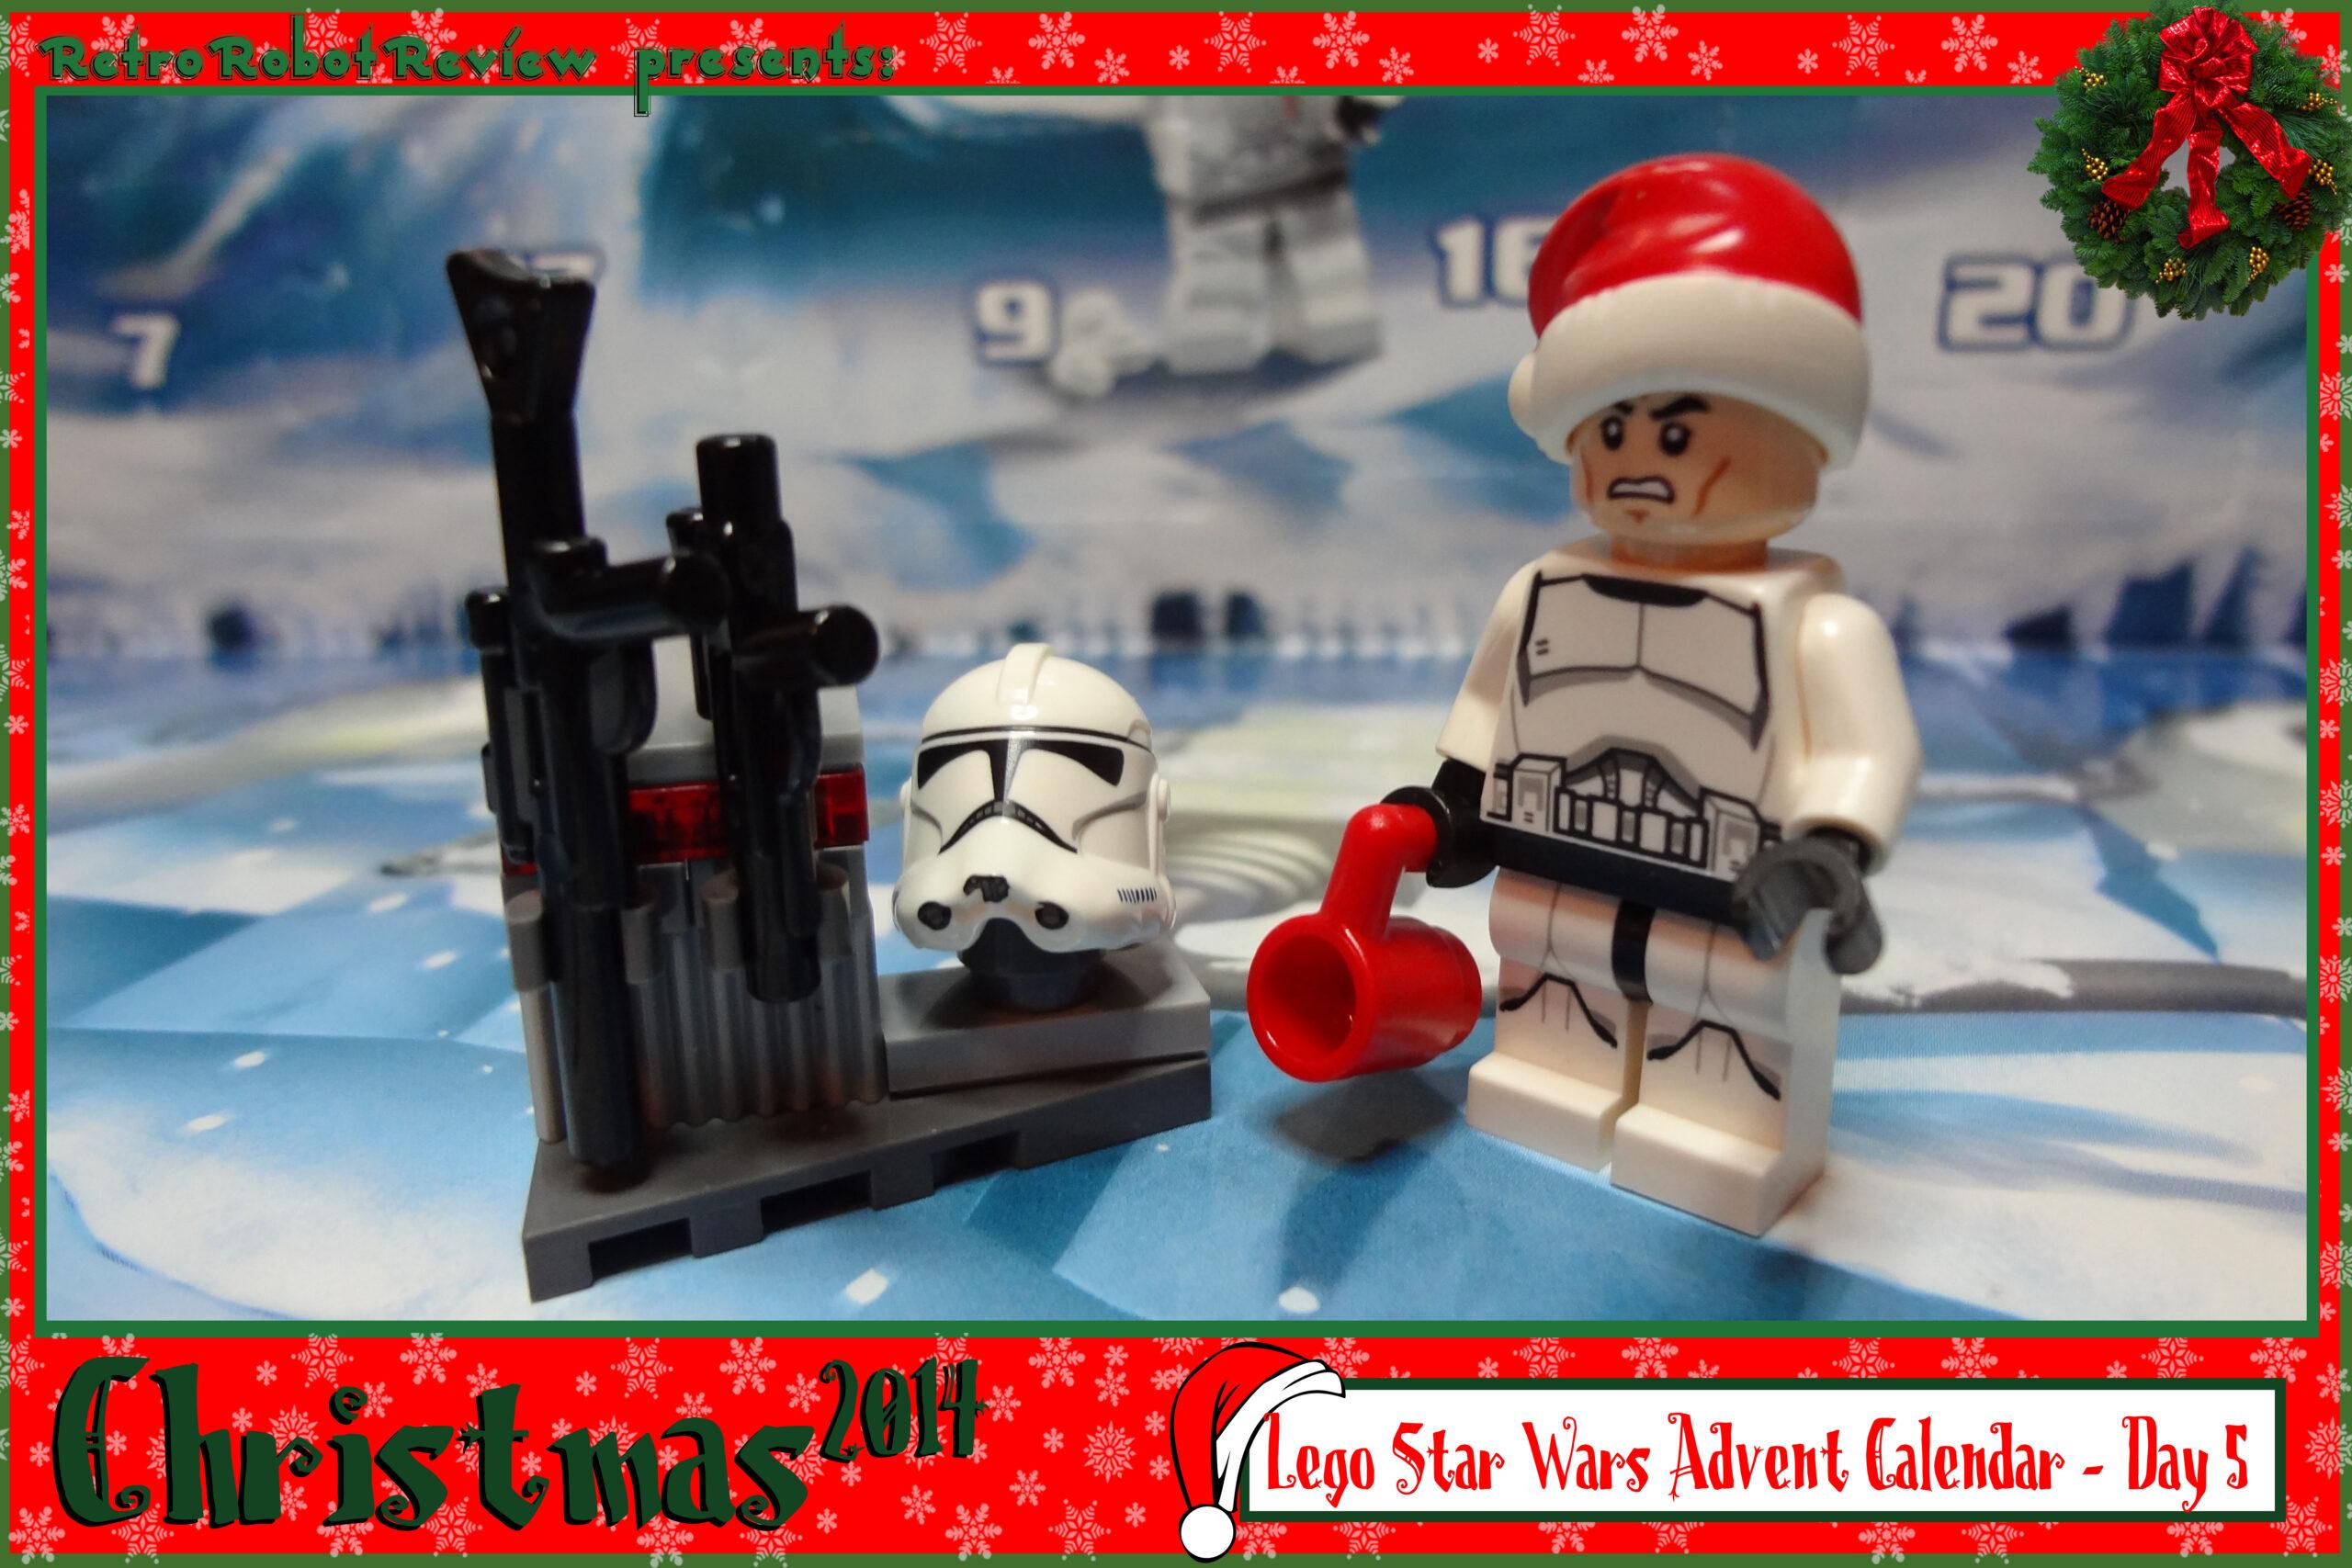 Lego Star Wars Advent Calendar  Day 5 pertaining to Lego Star Wars Advent Calendar Instructions